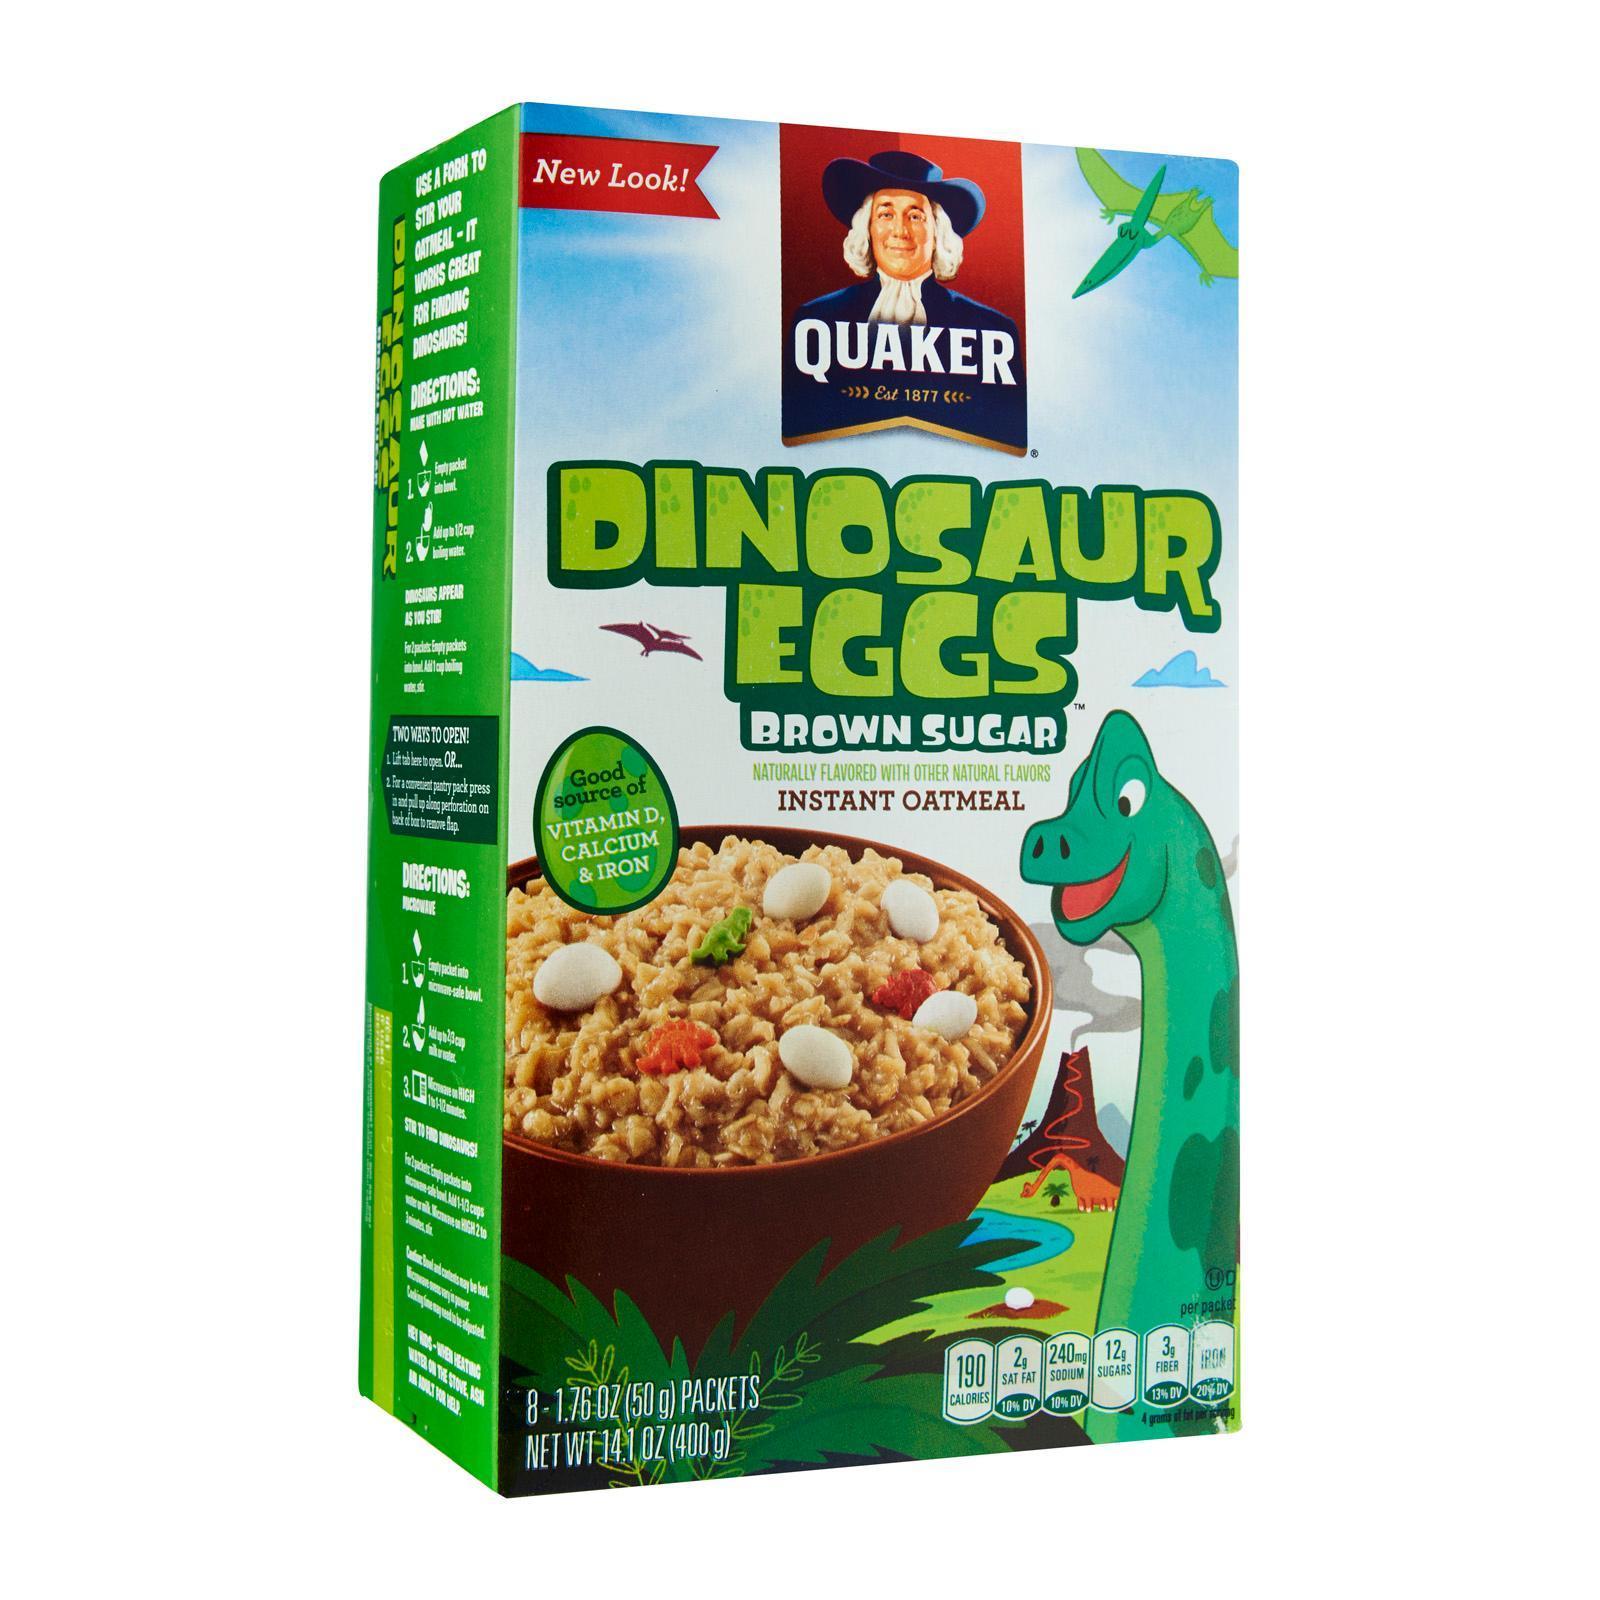 Quaker Instant Oatmeal with Brown Sugar Dinosaur Eggs